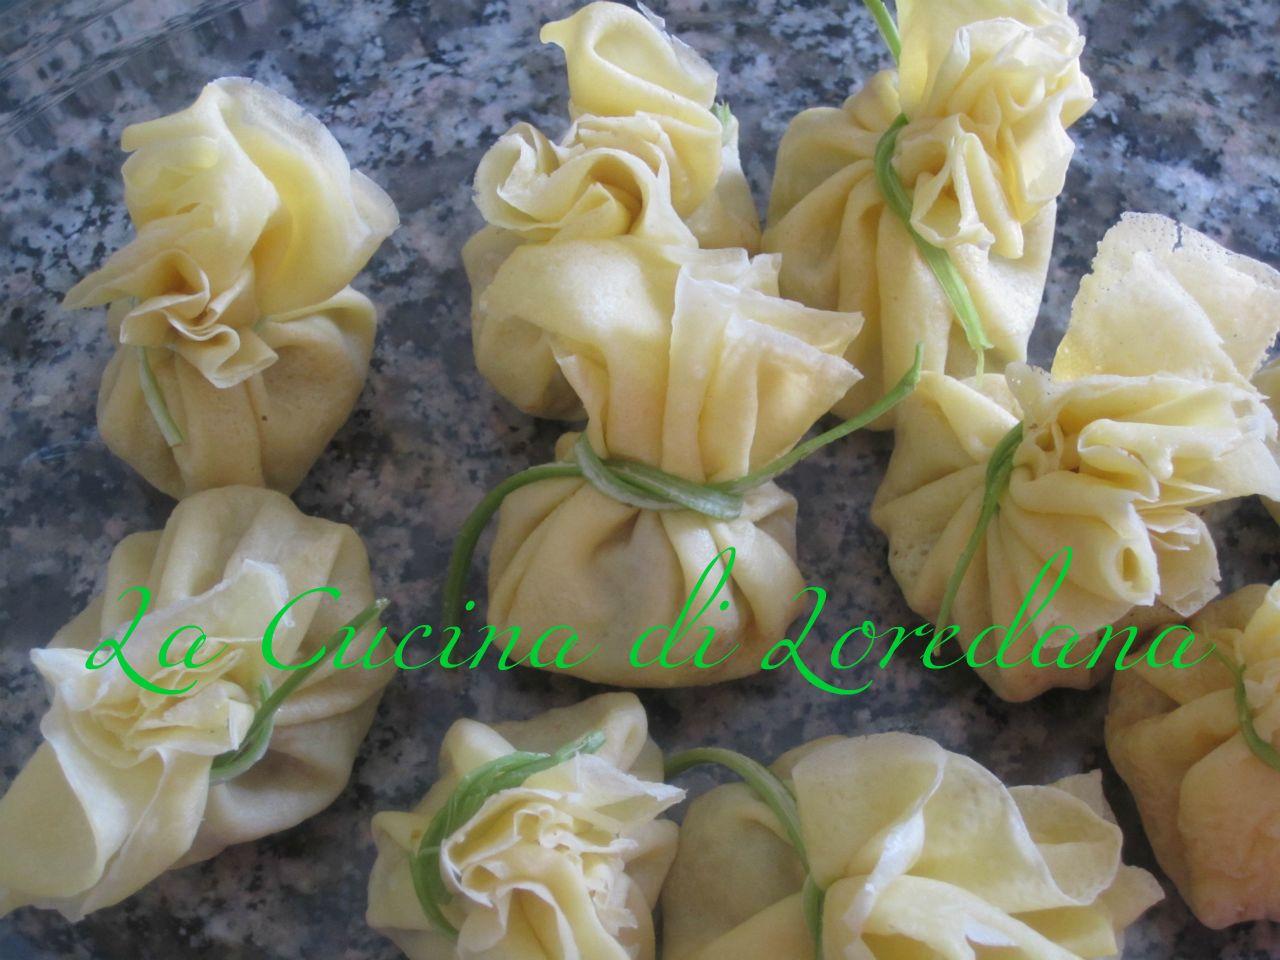 Crepes2 la cucina di loredana - Loredana in cucina ...